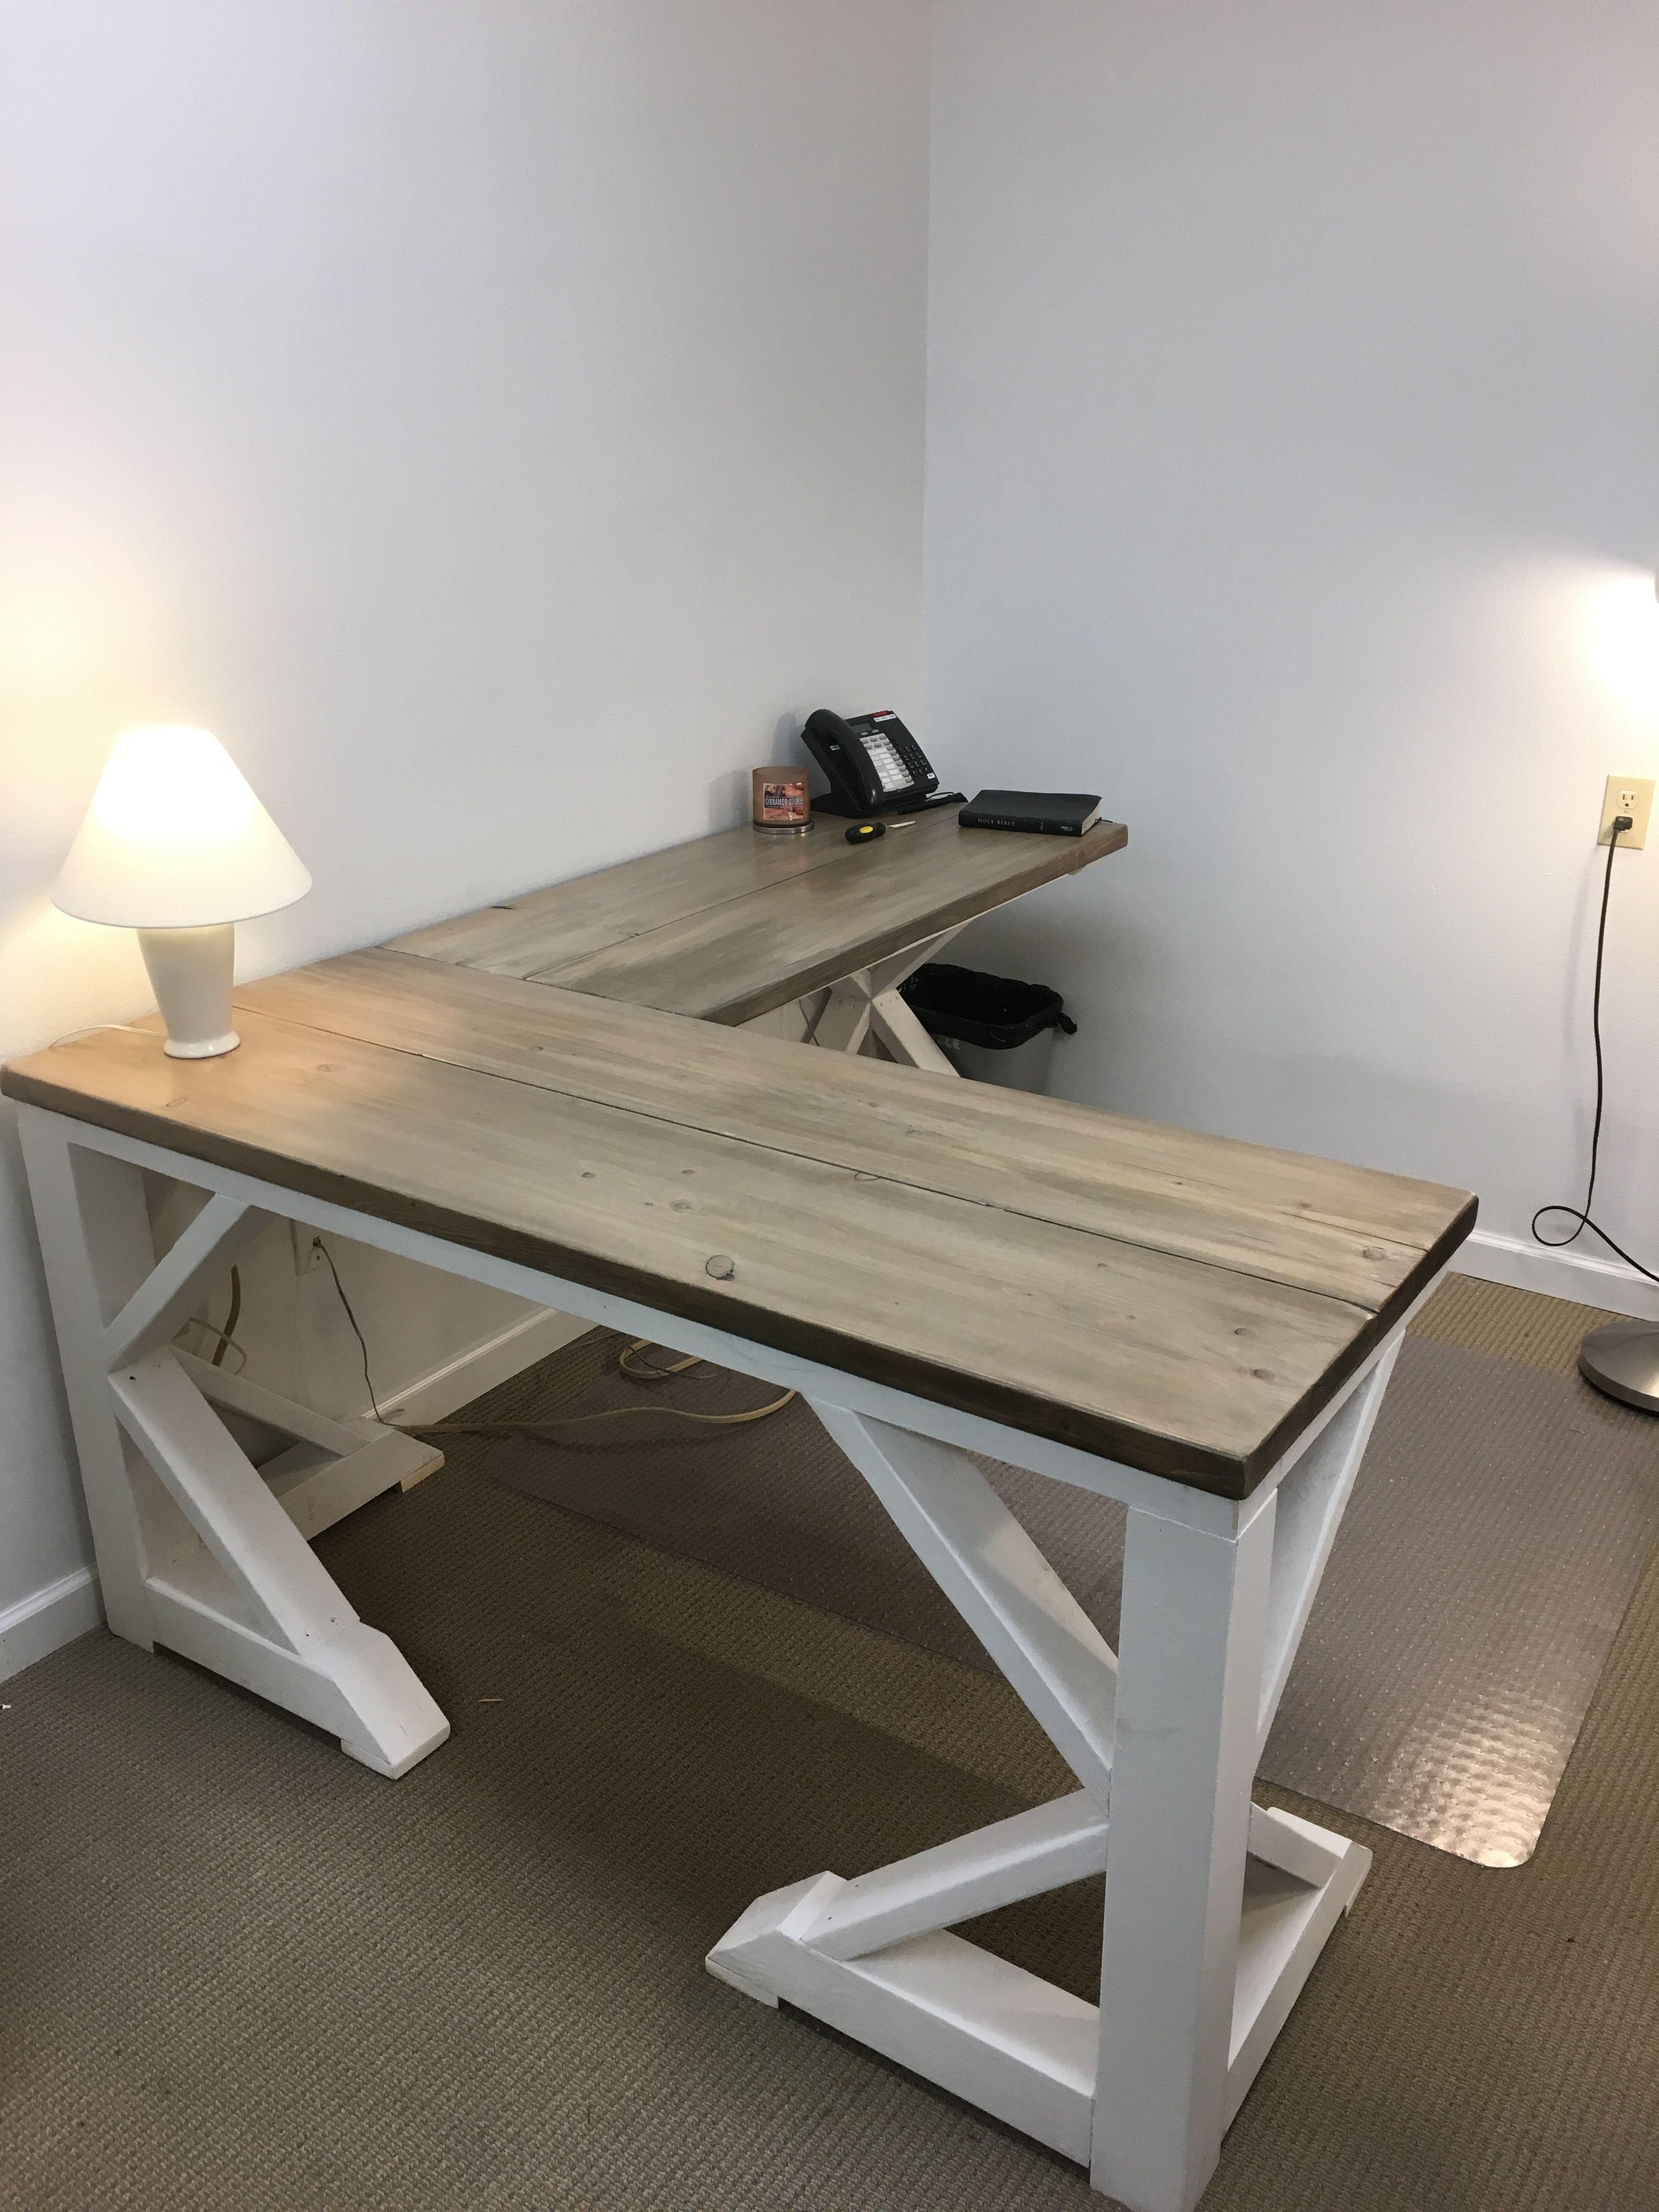 DIY Farmhouse Desk for $75.00 | Everything | Pinterest ...